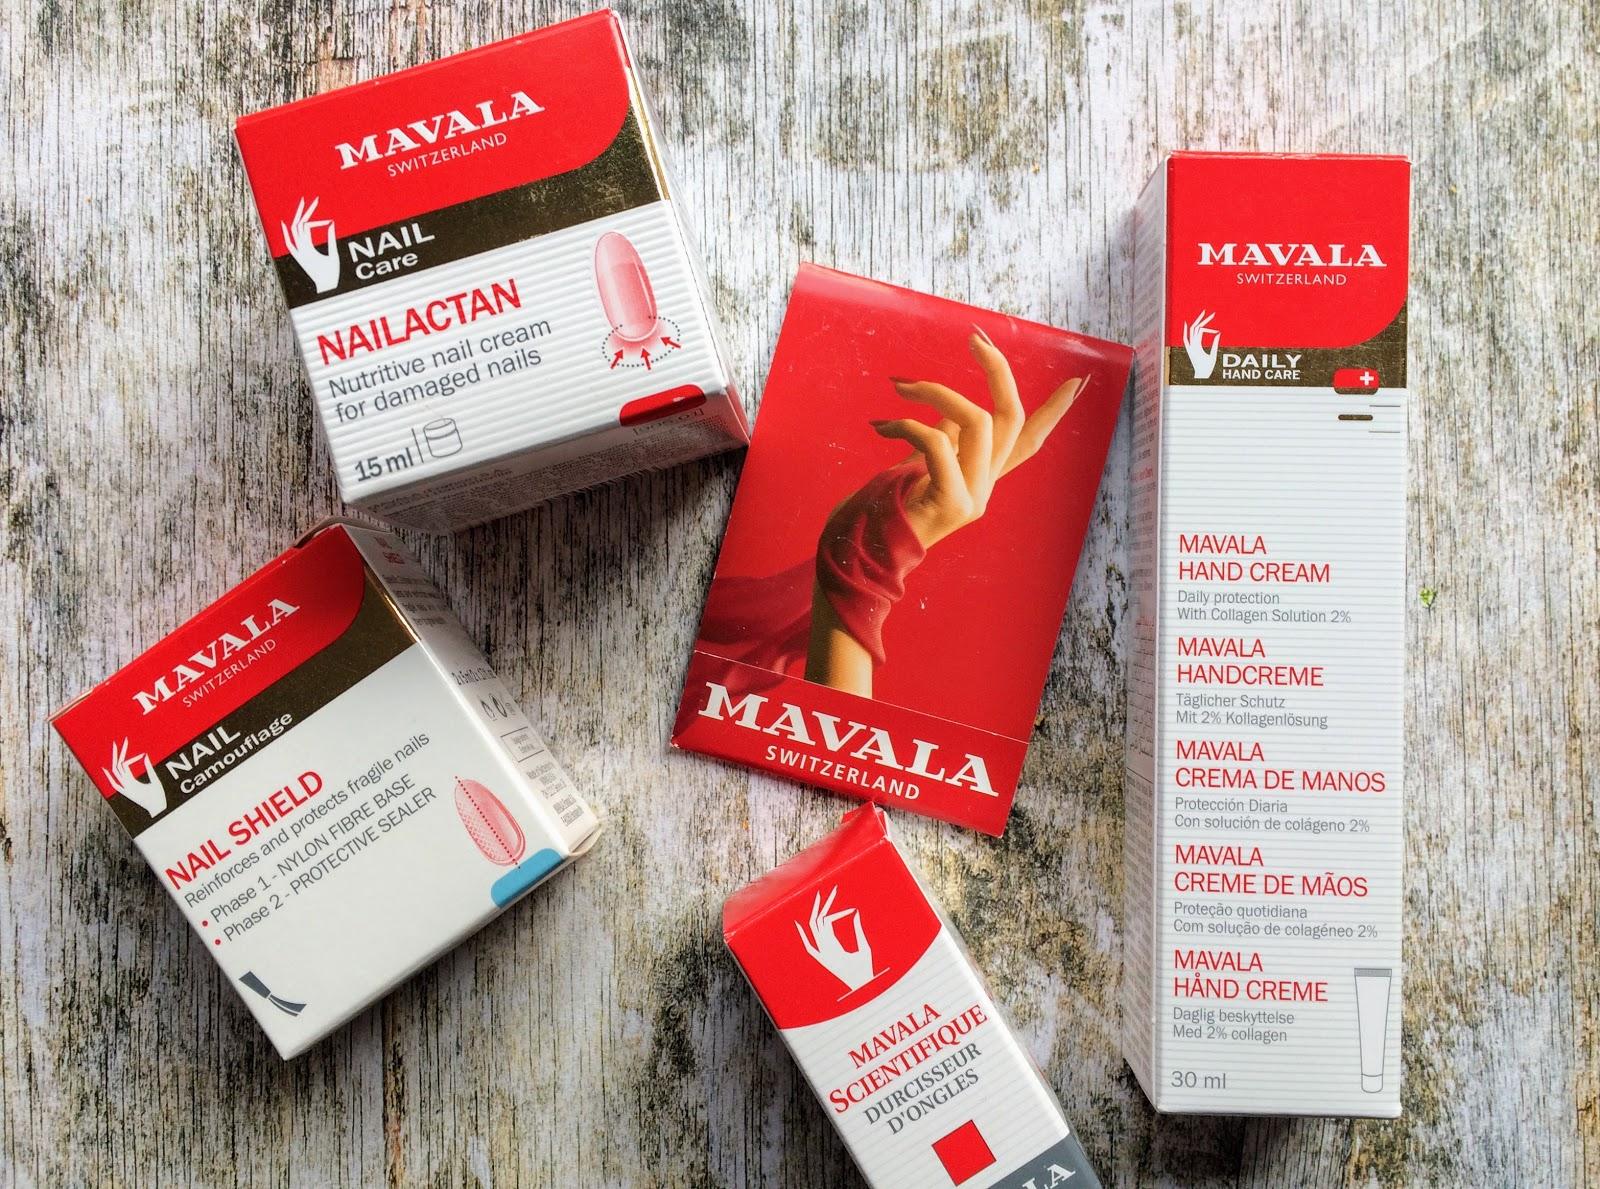 Mavala nail care products